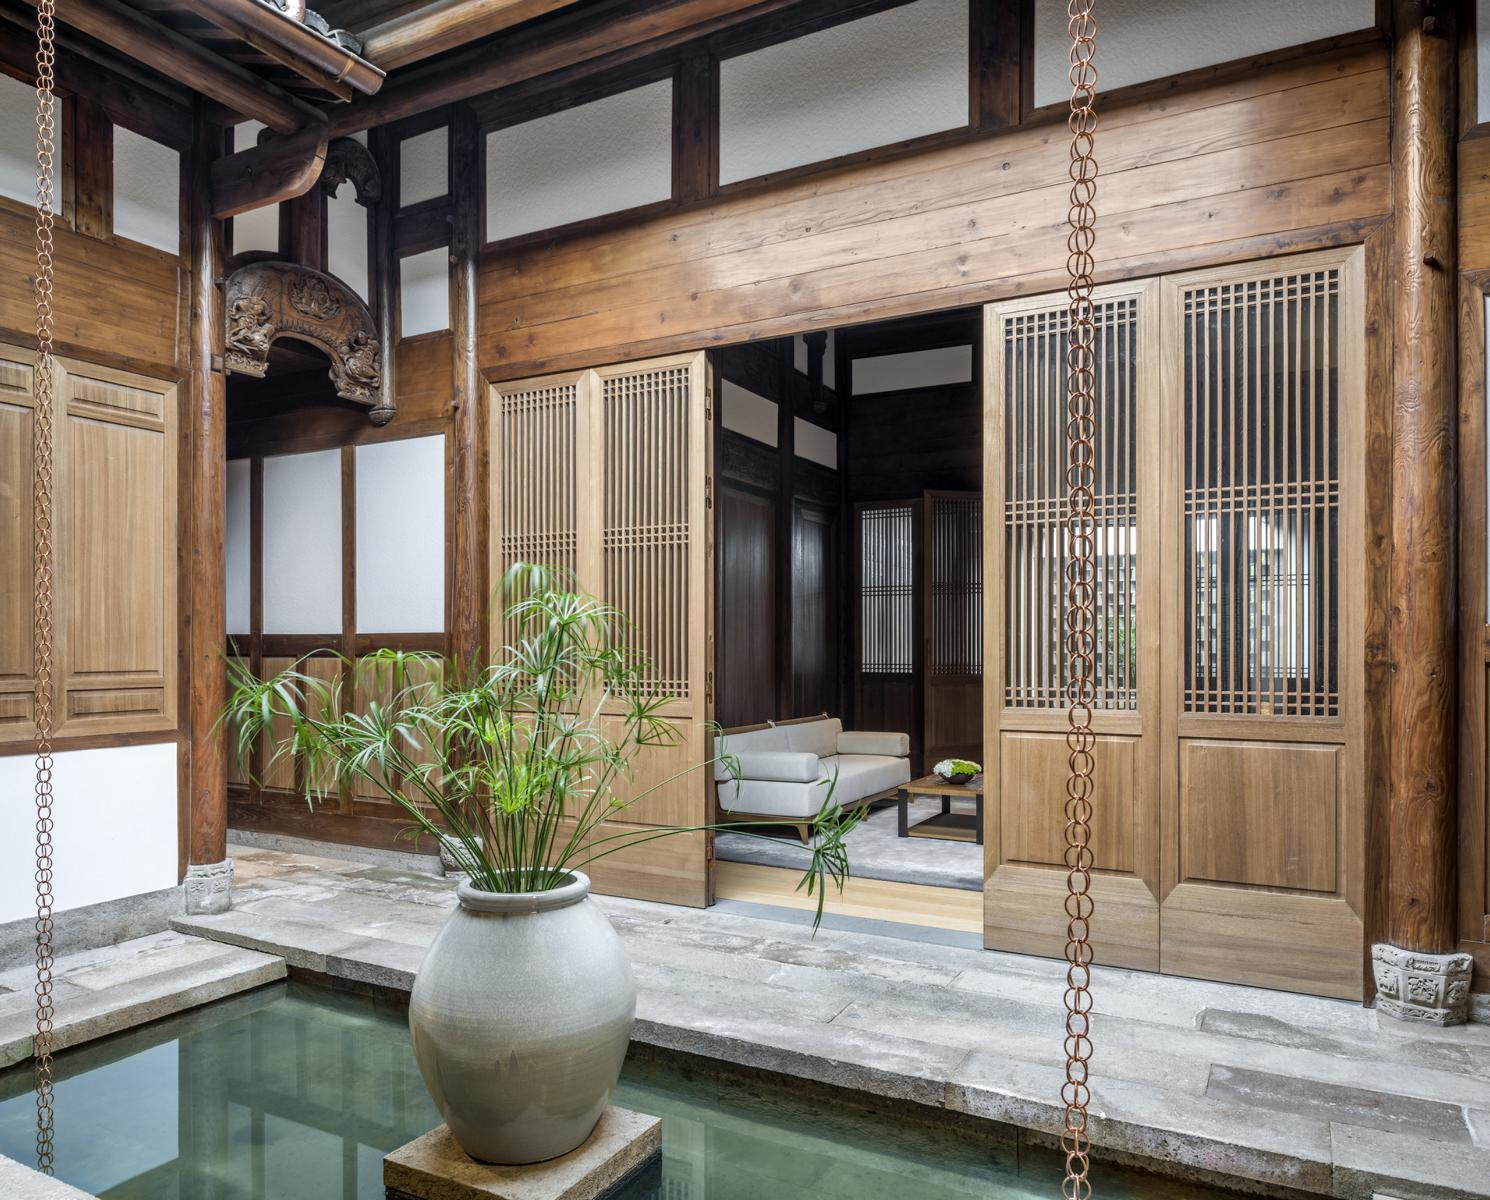 China - K1600_Amanyangyun-China-Villa-Four-Bedrooms-Courtyard_High-Res_16168.jpg